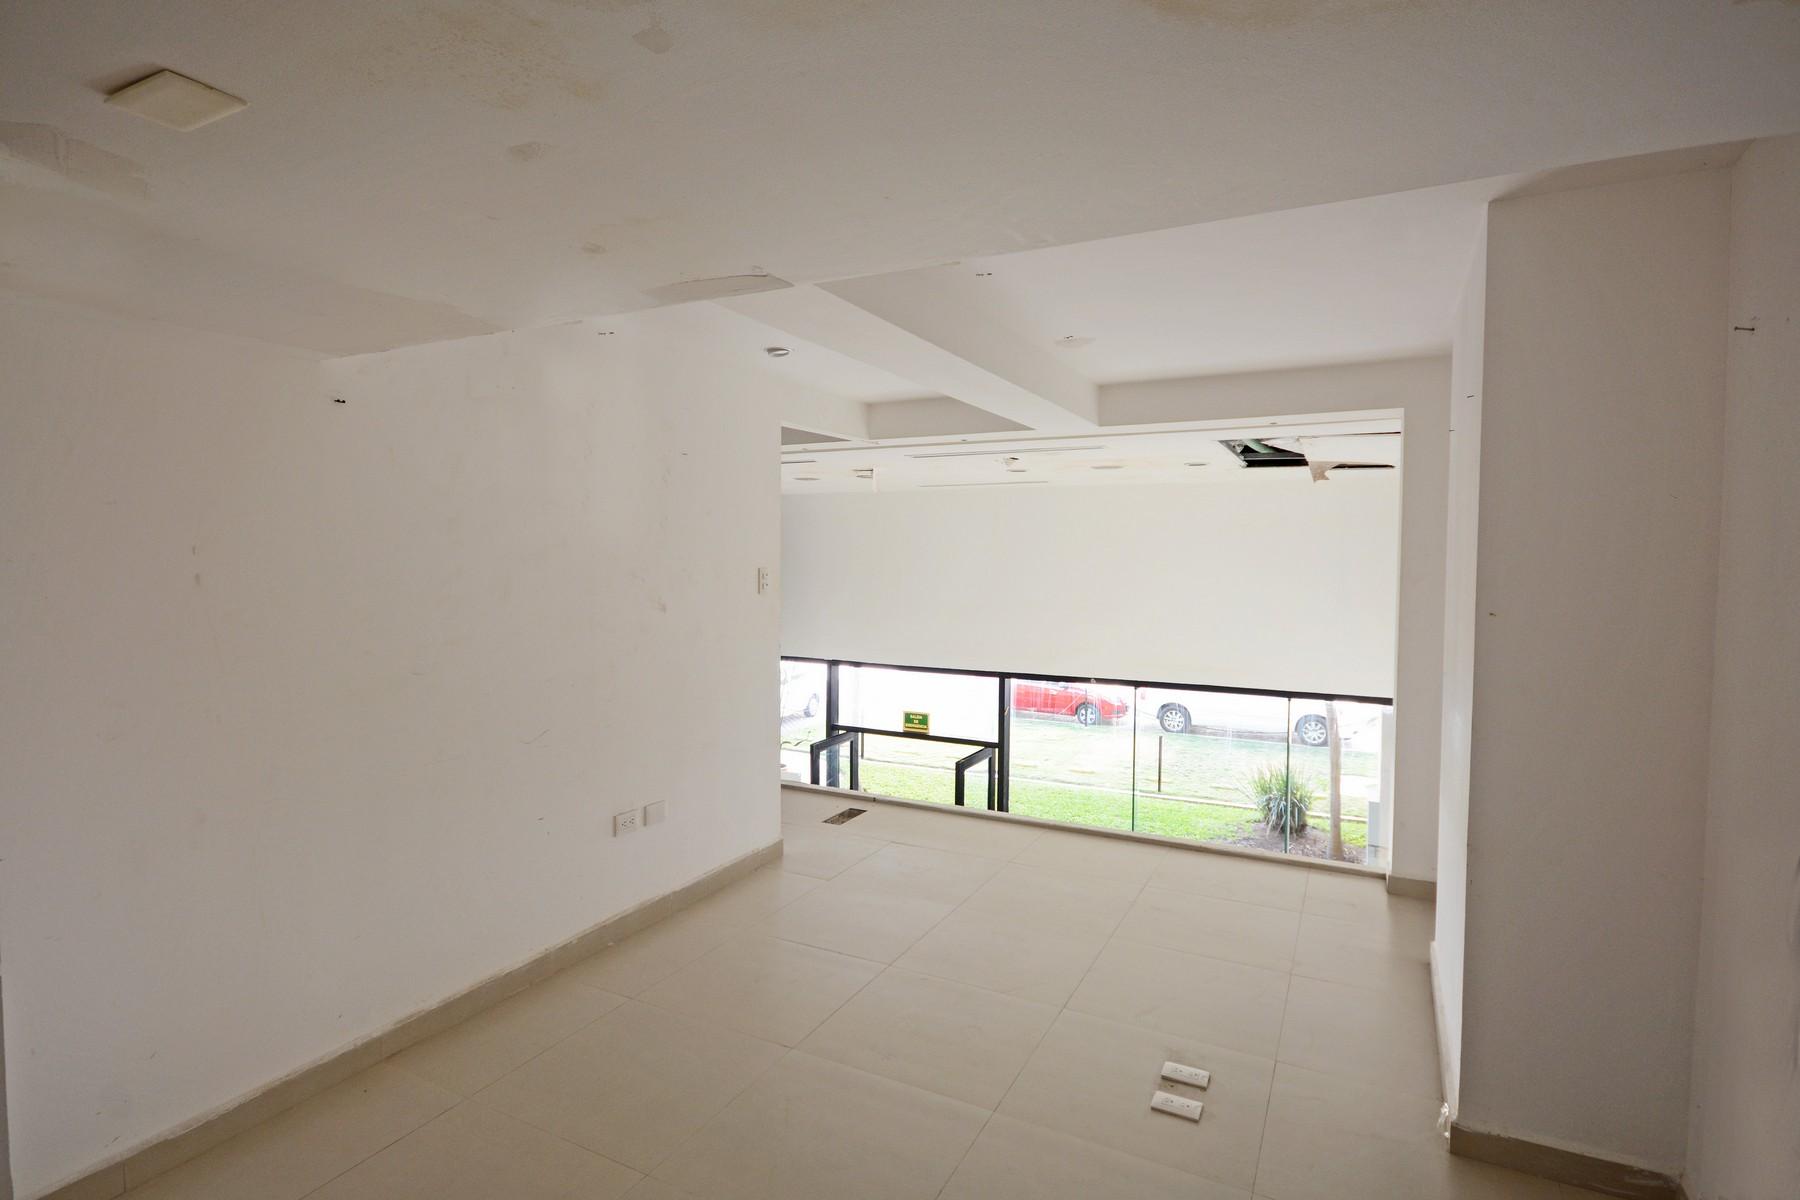 Additional photo for property listing at ALDEA THAI 23 COMMERCIAL SPACE Aldea Thai #23 Avenida Cozumel entre las Calles 26 y 28 Norte Playa Del Carmen, Quintana Roo 77710 Mexico